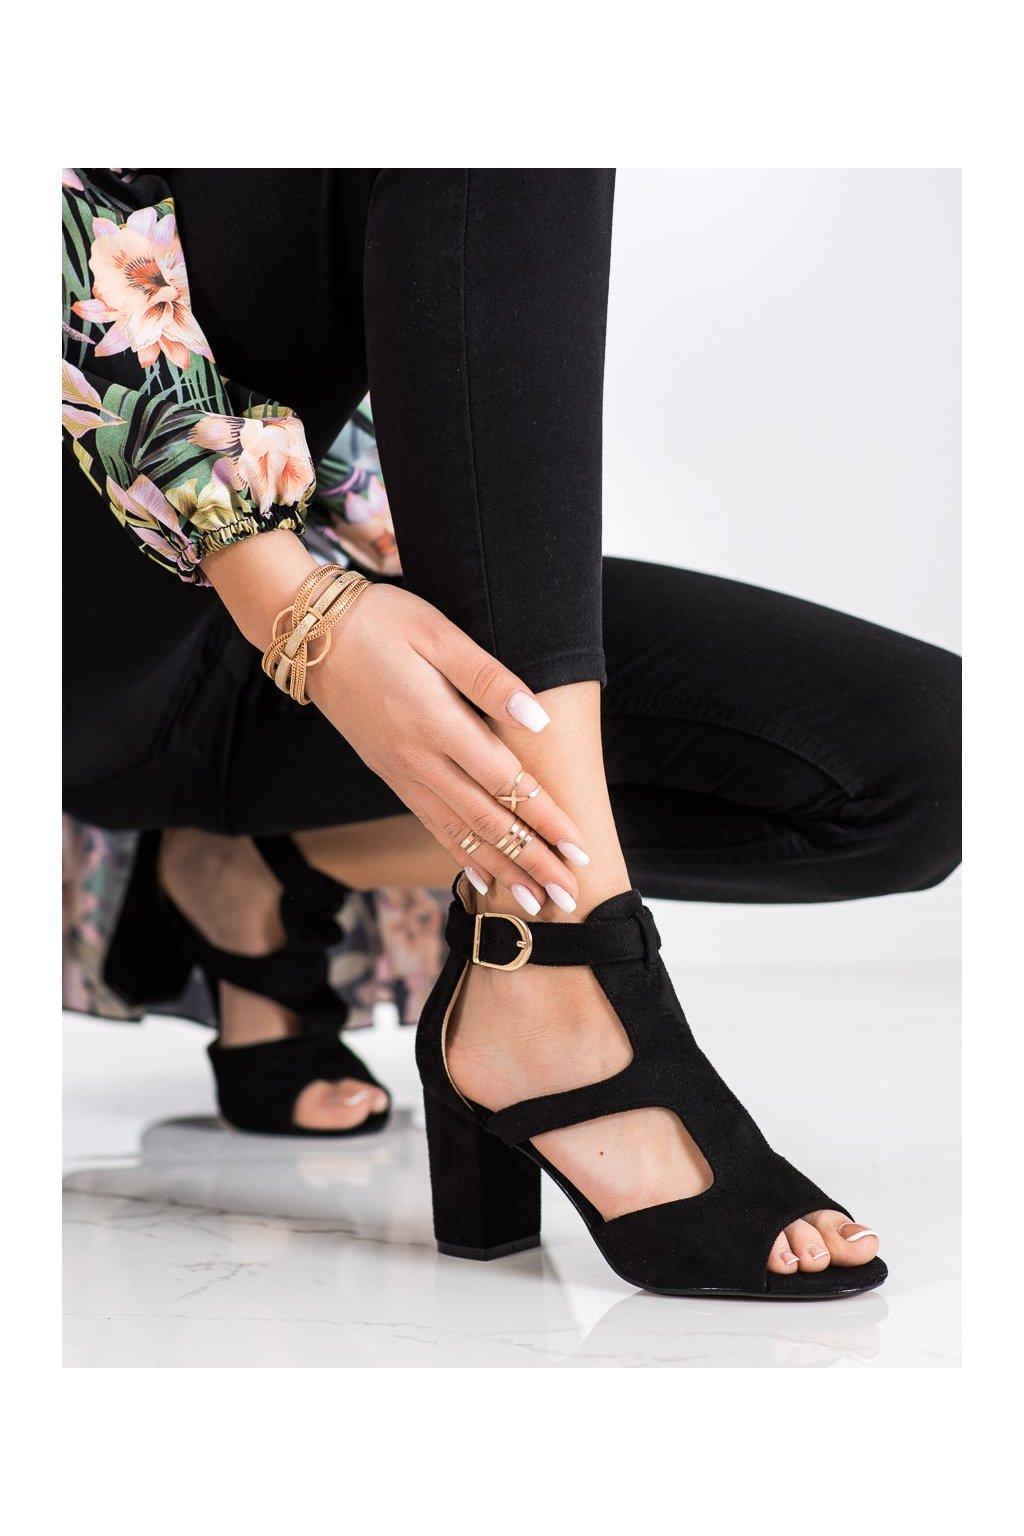 Čierne sandále na podpätku Sabatina kod DM19-20B